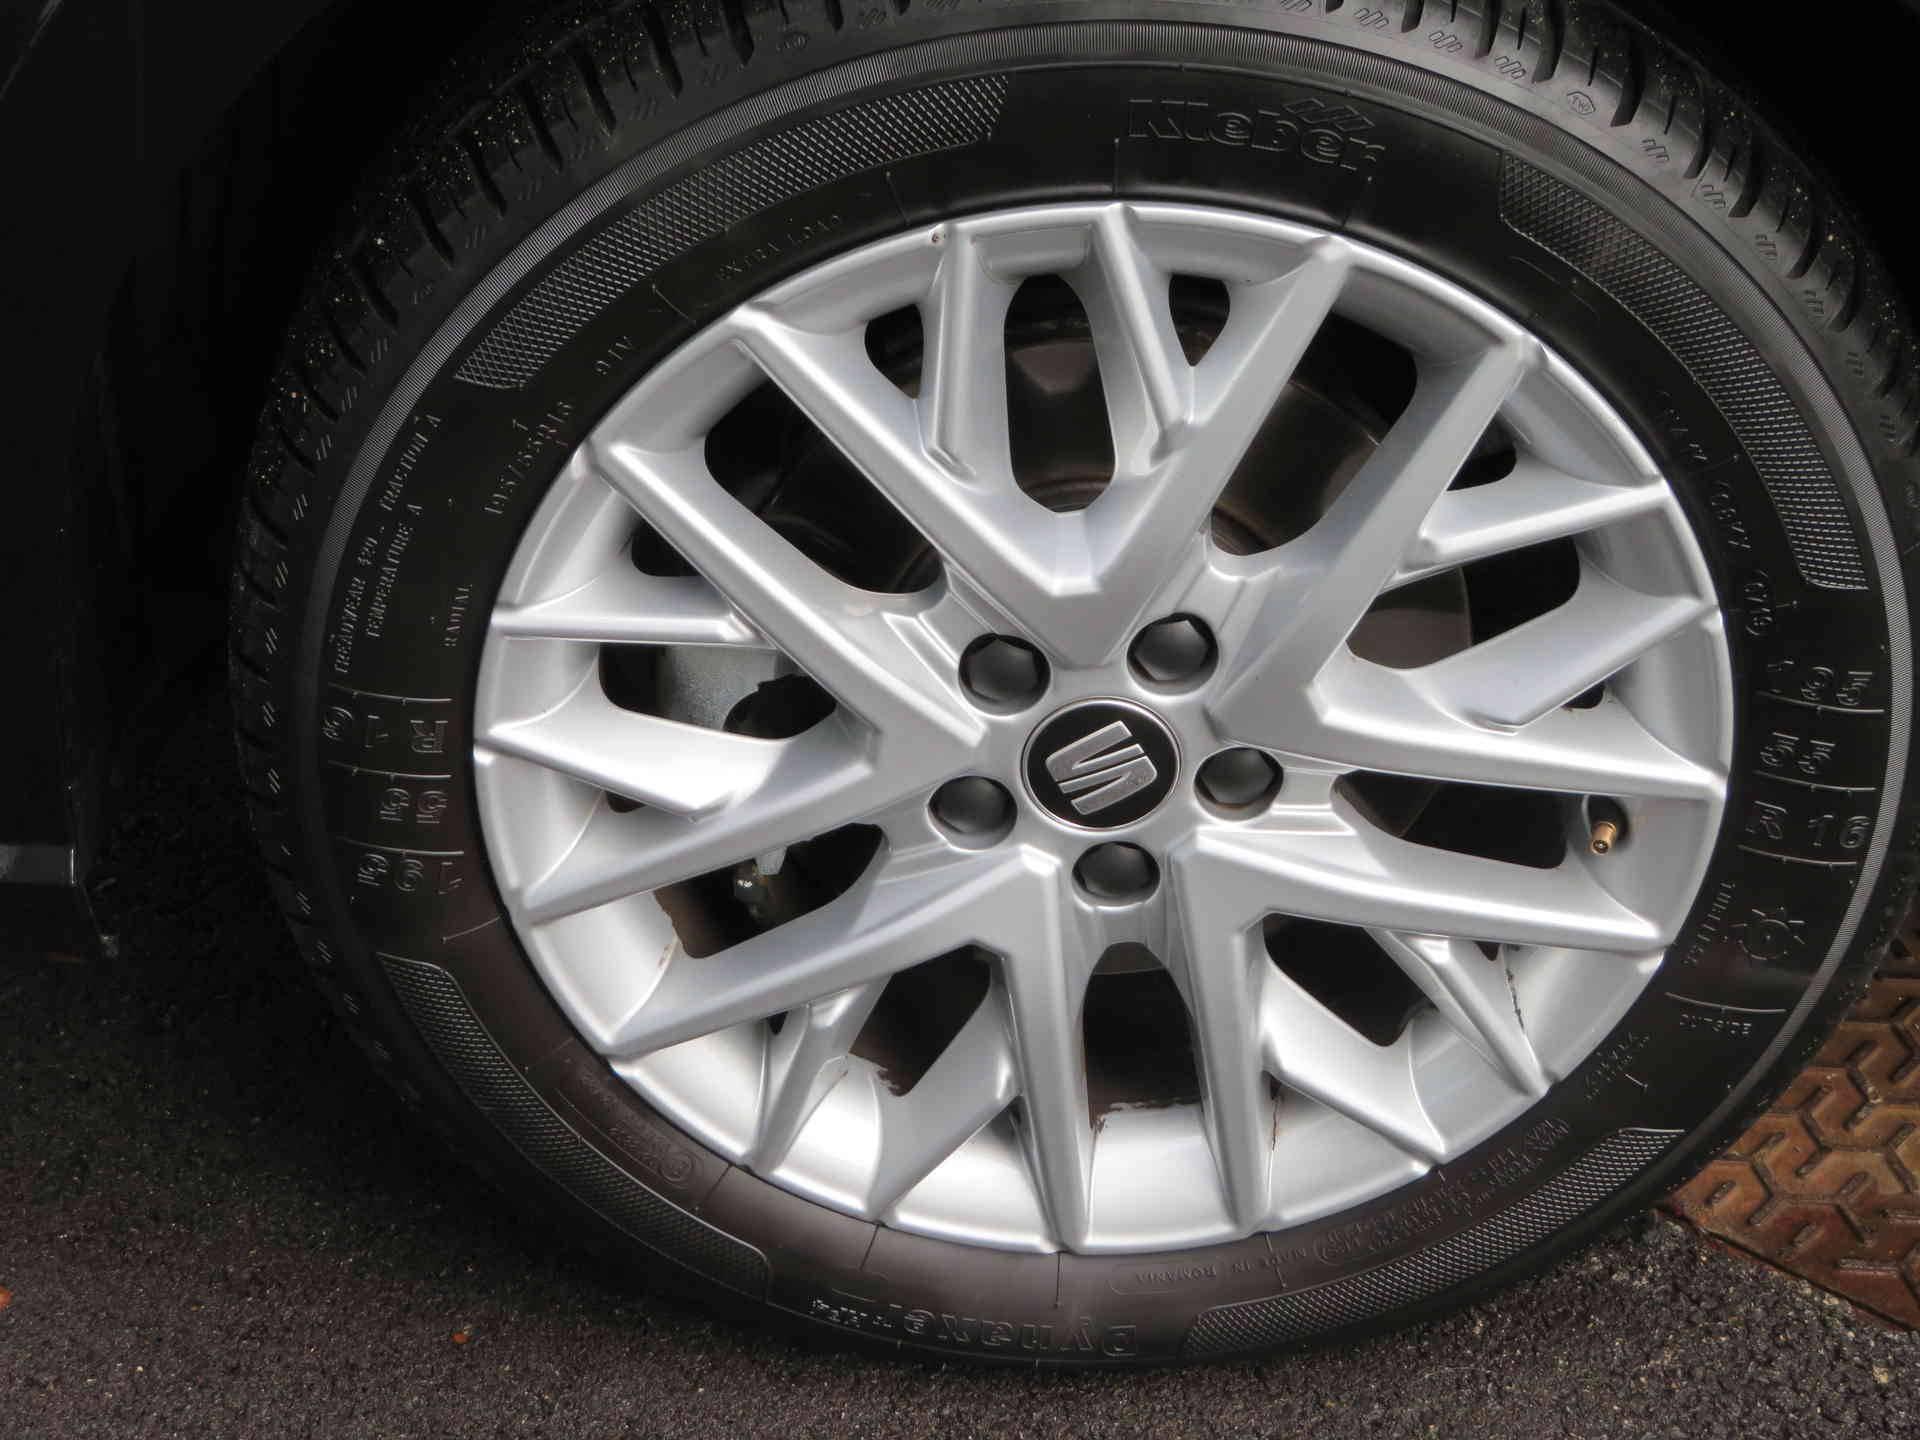 5 - Ibiza 1.6 TDI 95 ch S/S BVM5